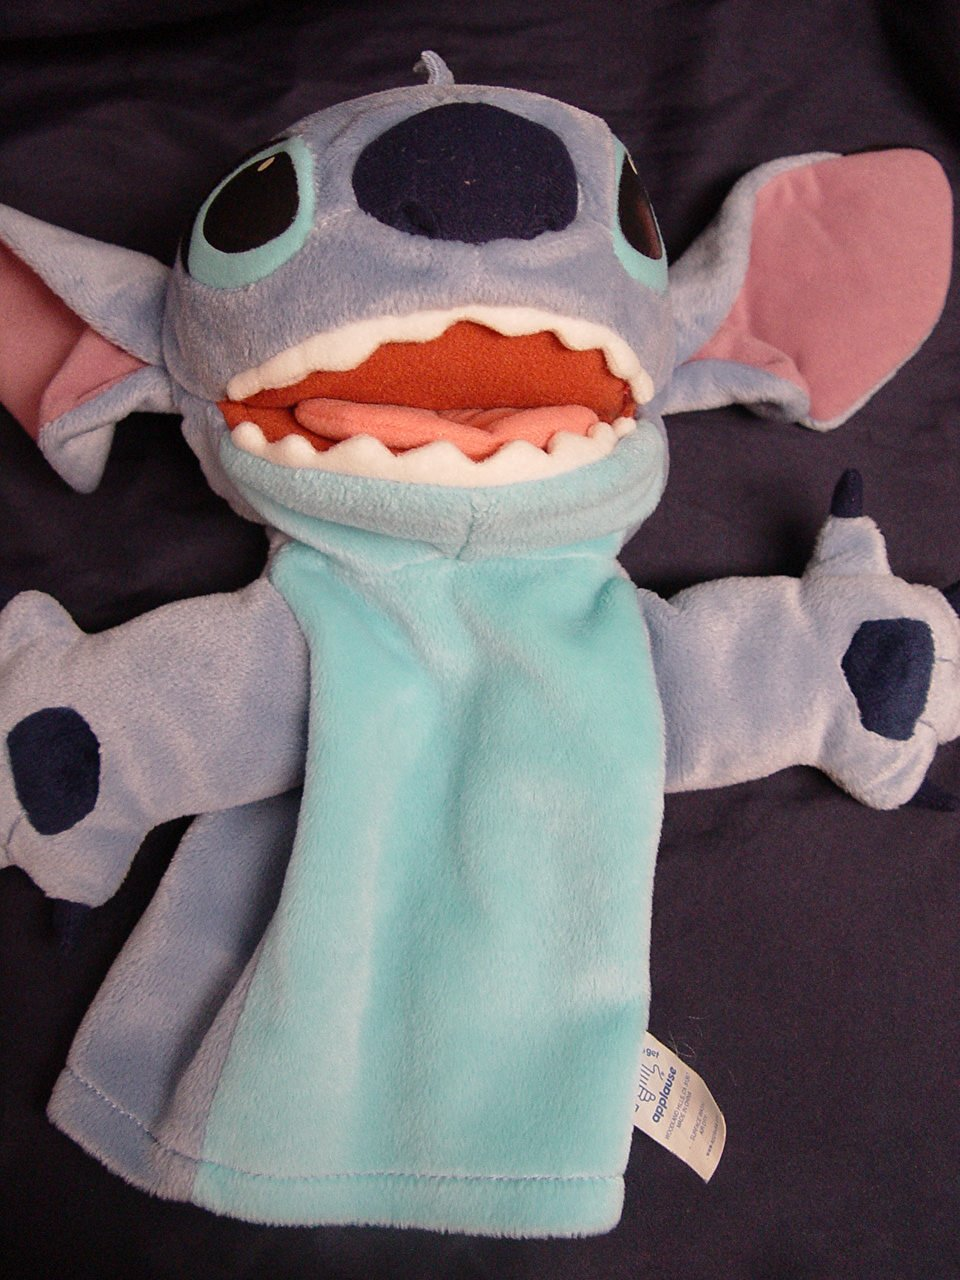 Buy Disney Lilo and Stitch Duffle Kit Gym Sports Travel Holdall ... 461f44a6b51ee